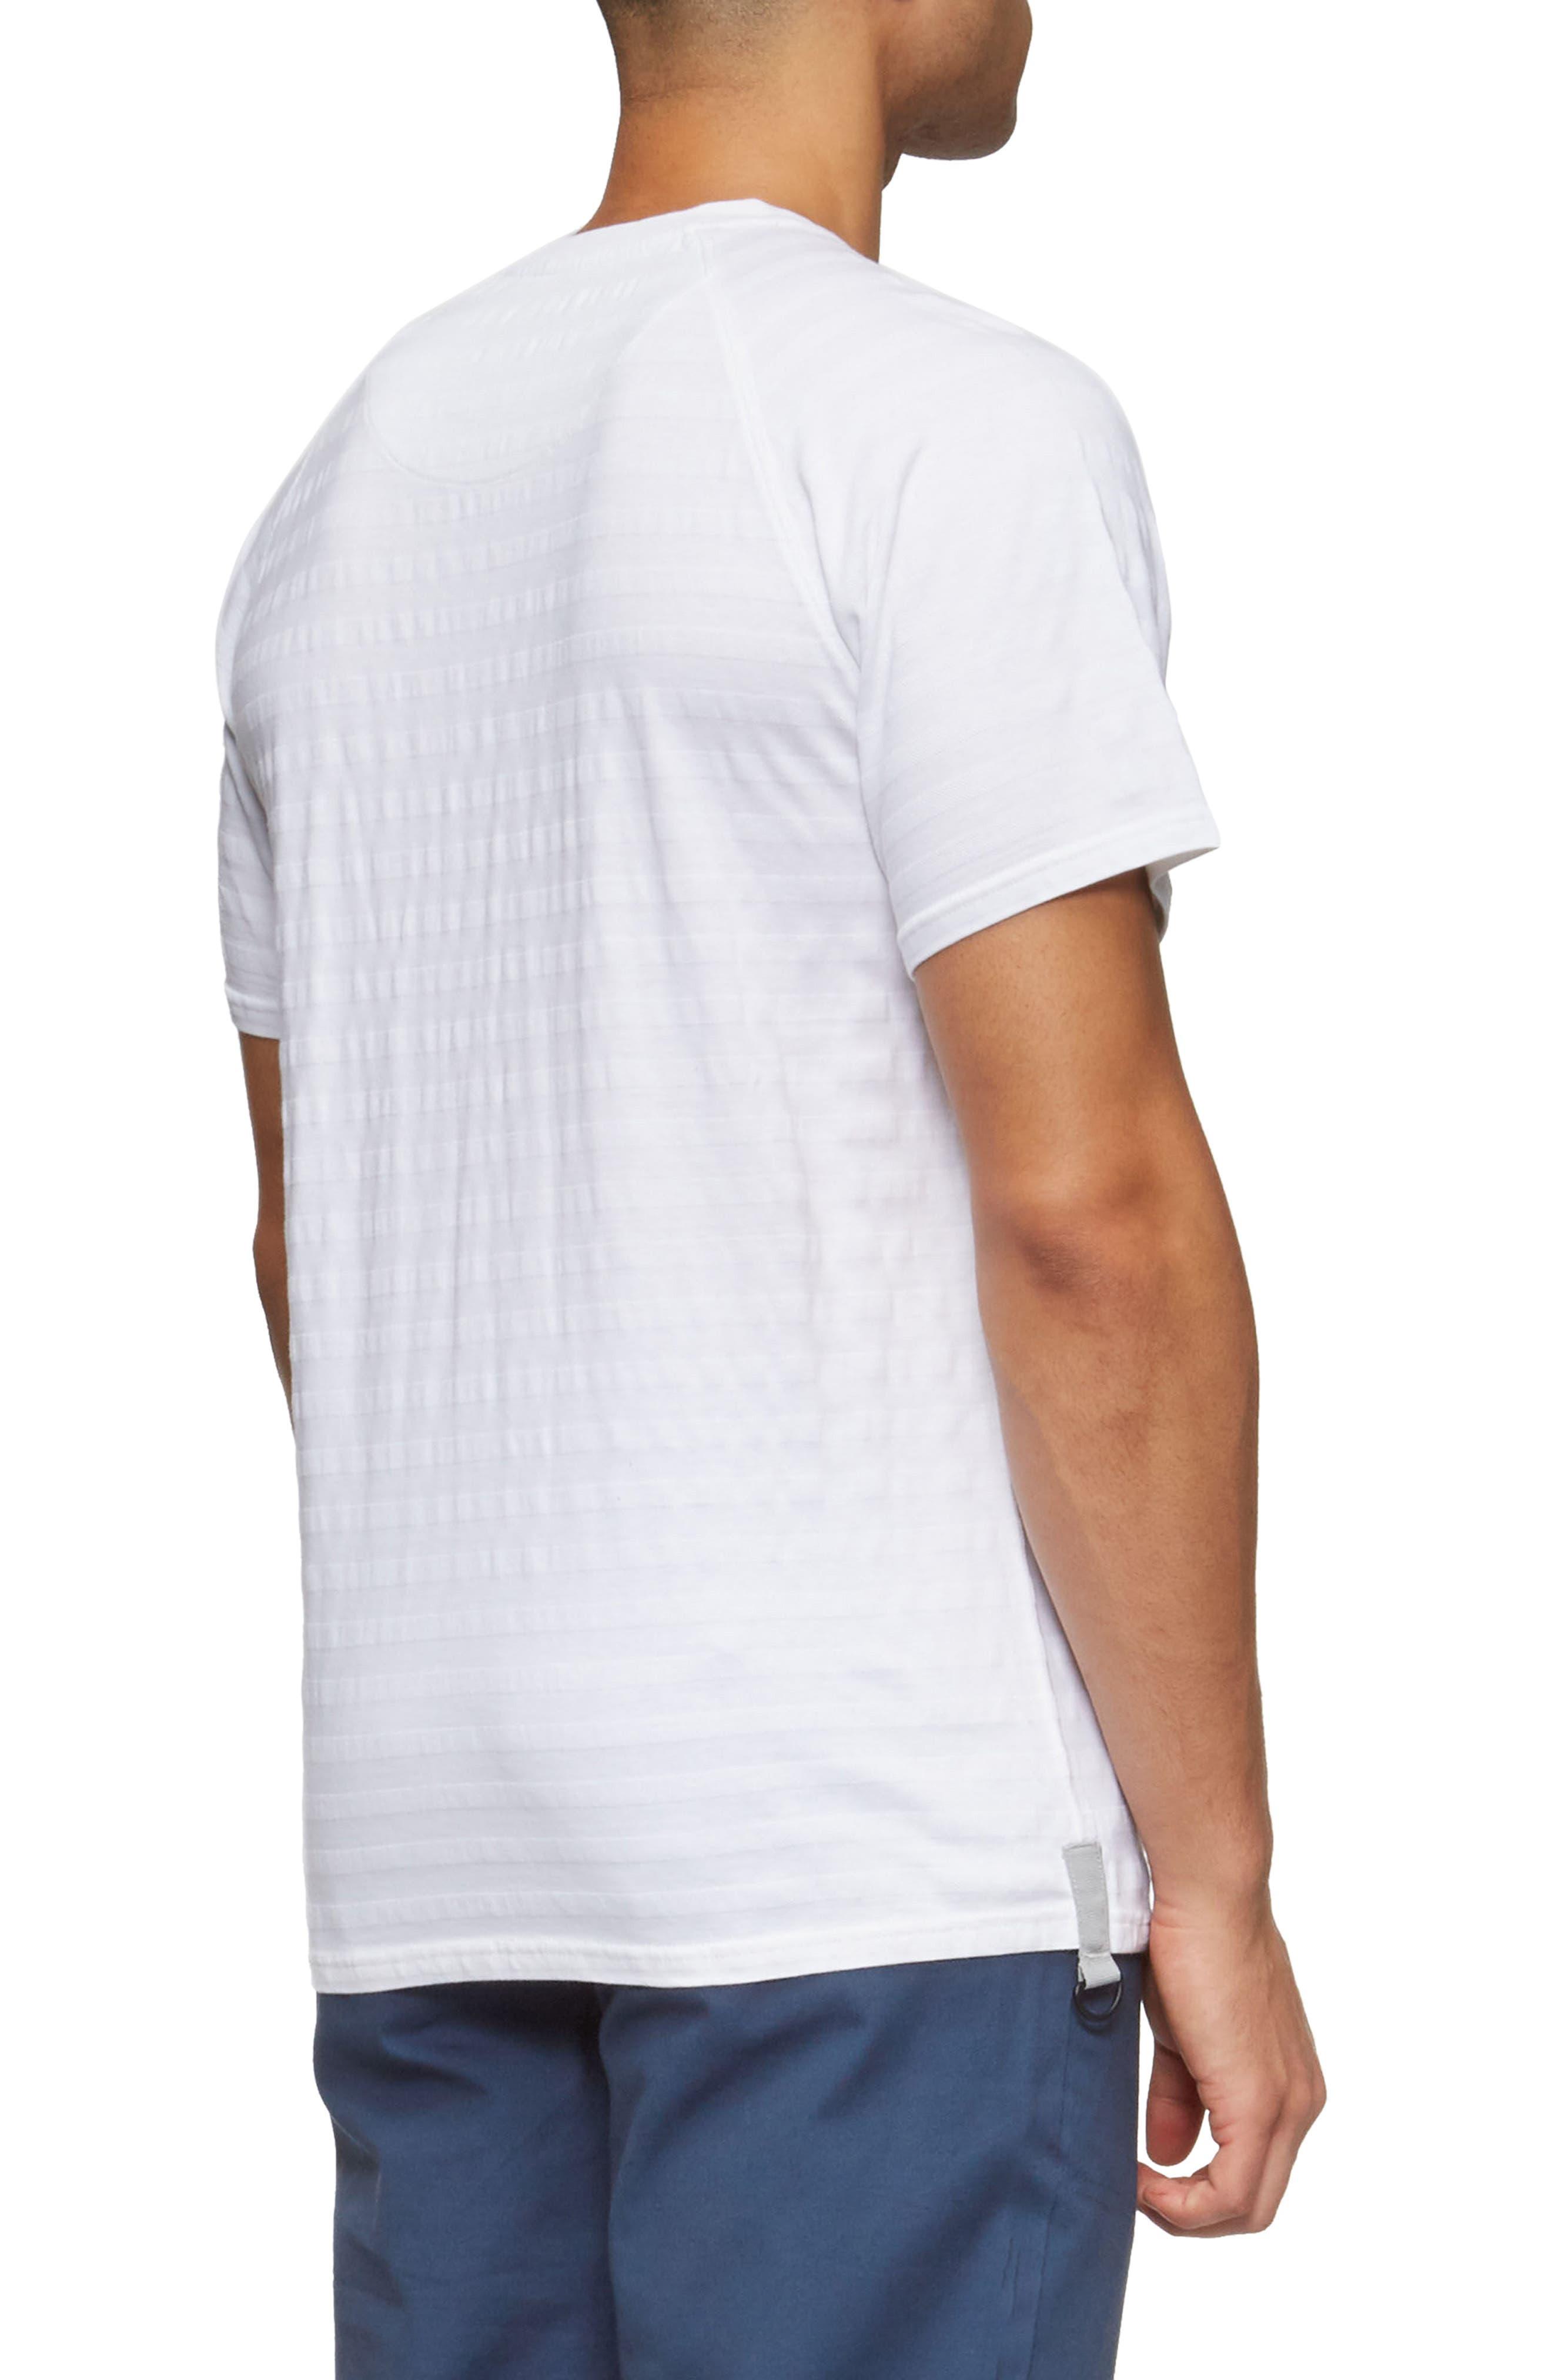 Modus T-Shirt,                             Alternate thumbnail 2, color,                             White